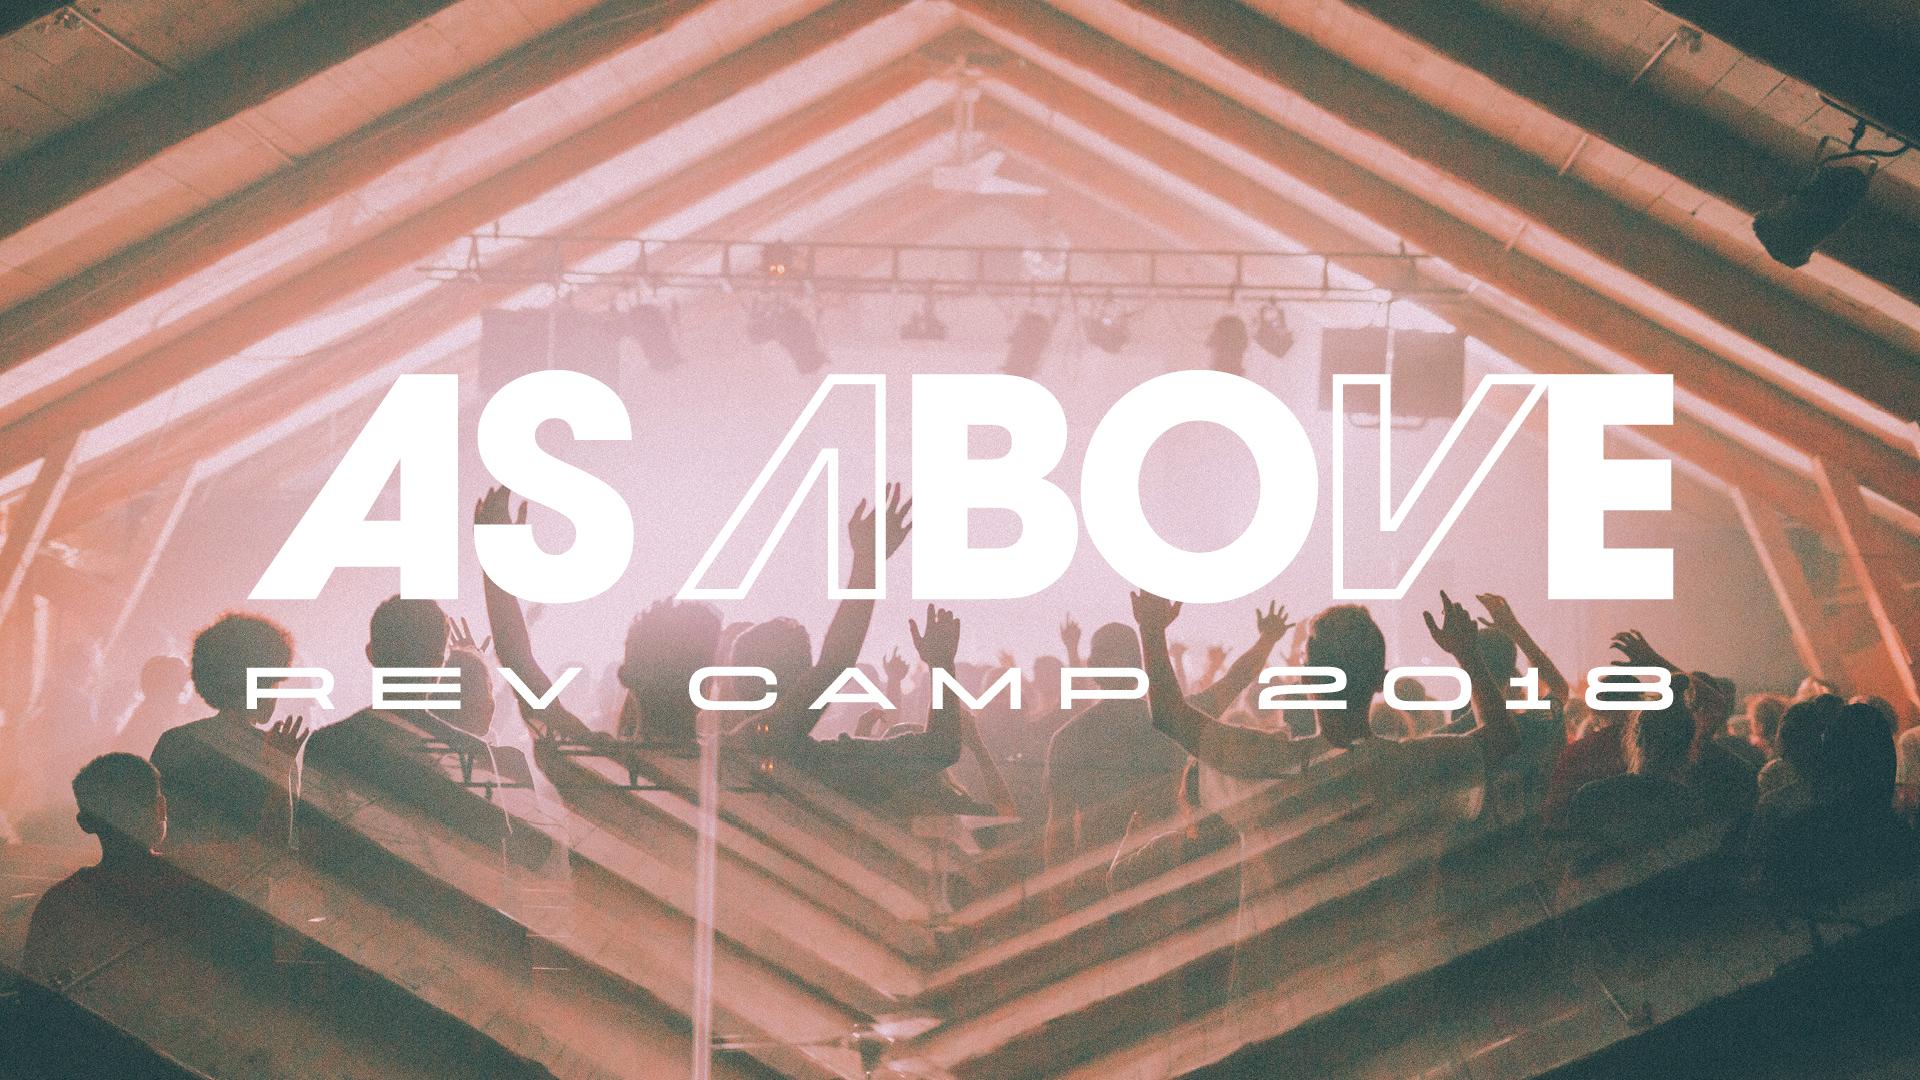 Rev Camp 2018 As Above Generic Slides5.jpg